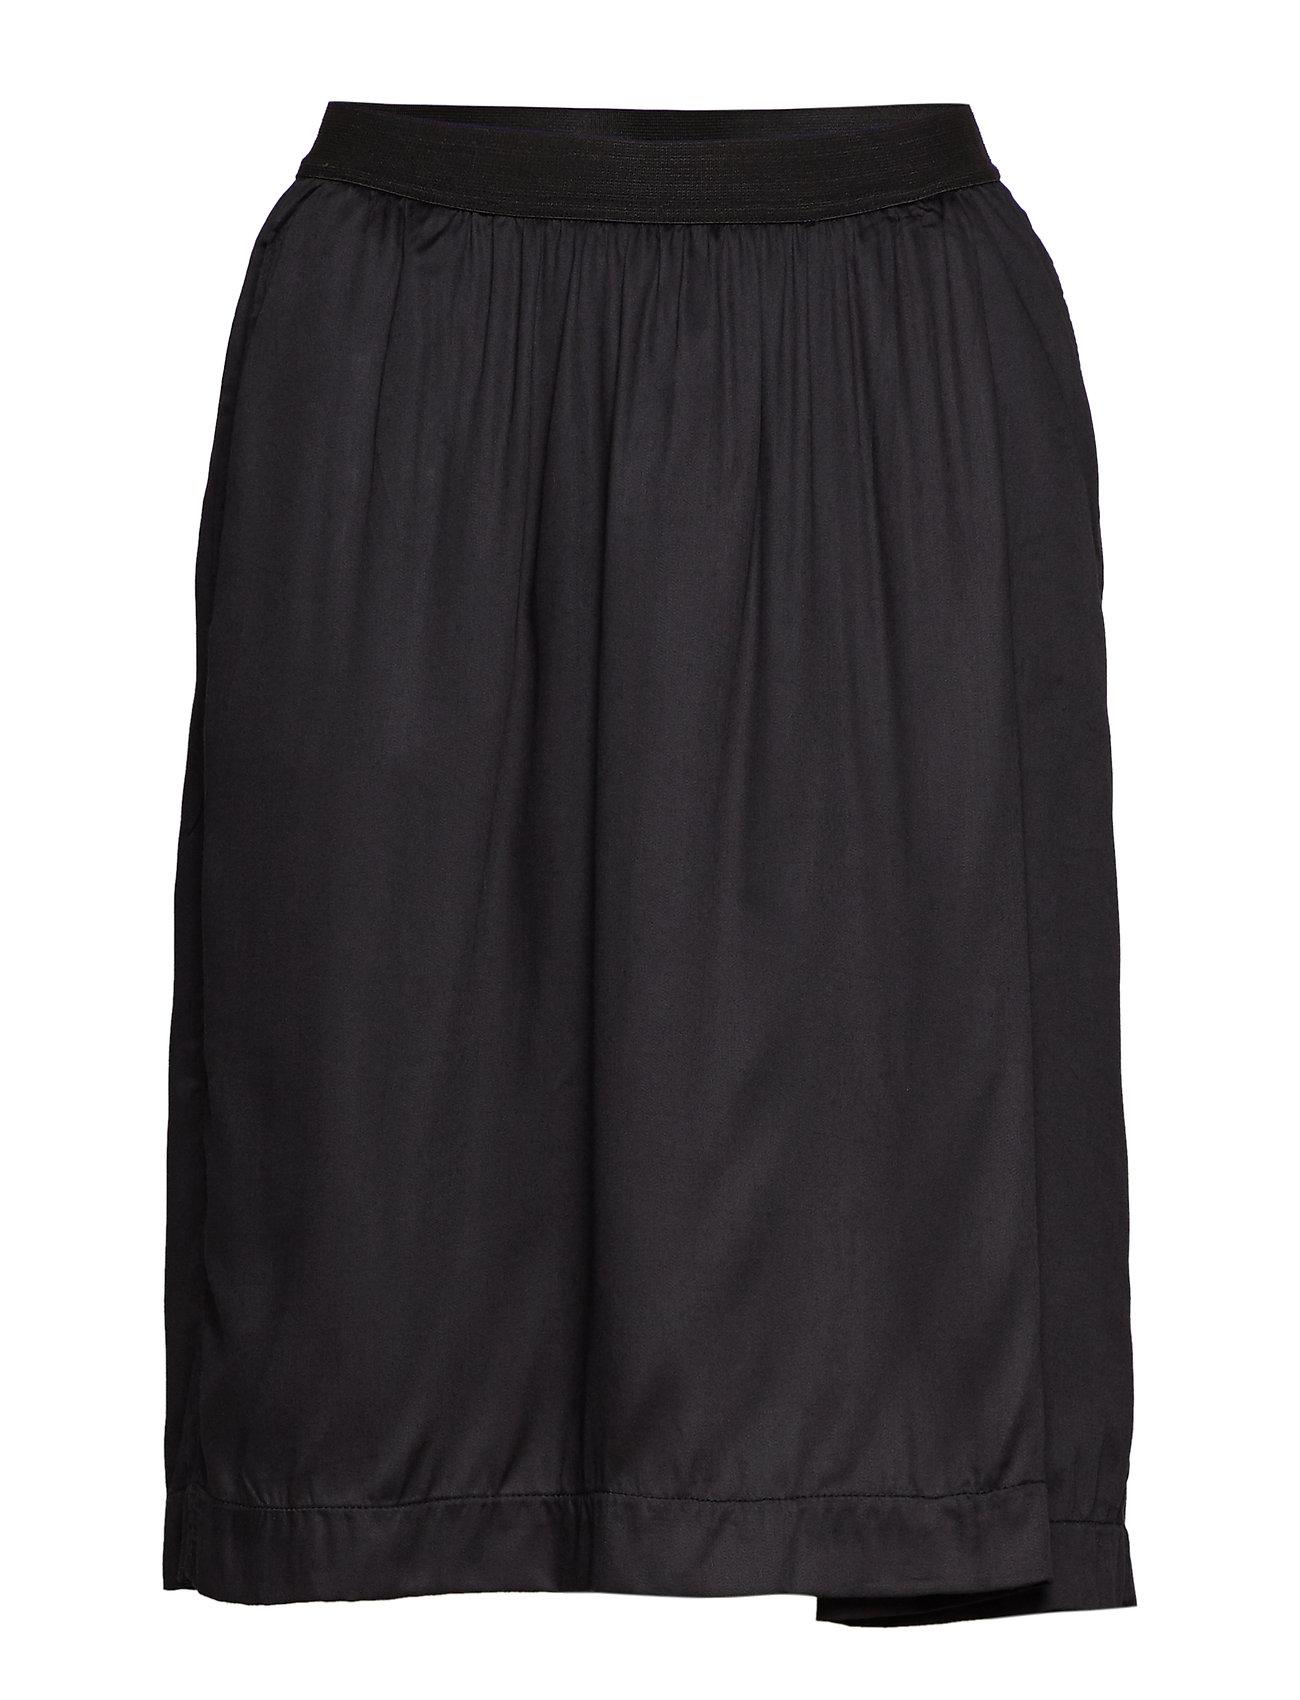 Moshi Moshi Mind palma skirt - BLACK